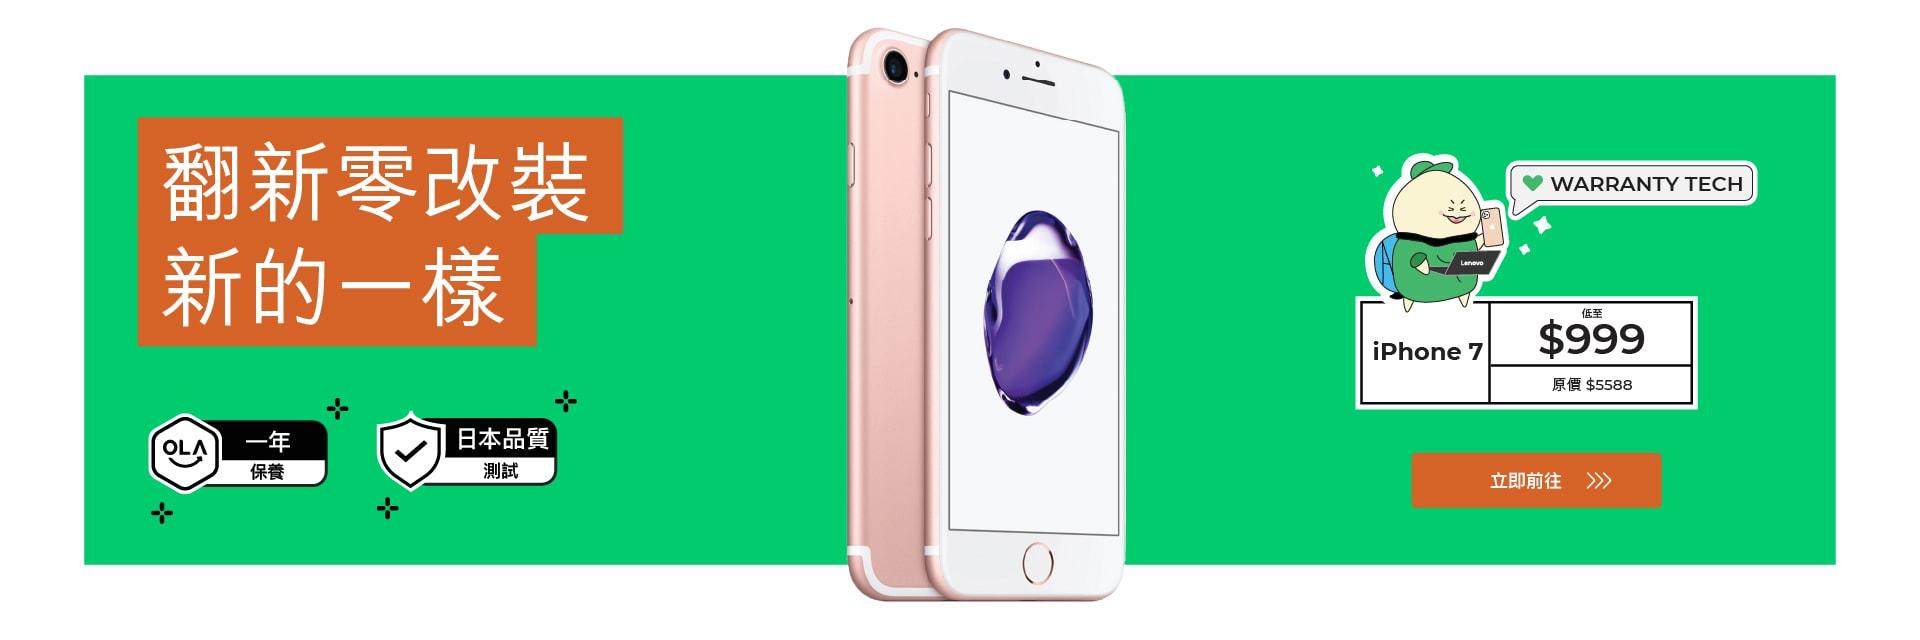 Ola Tech 翻新零改裝新的一樣 蘋果 Apple iPhone 7 Mobile View